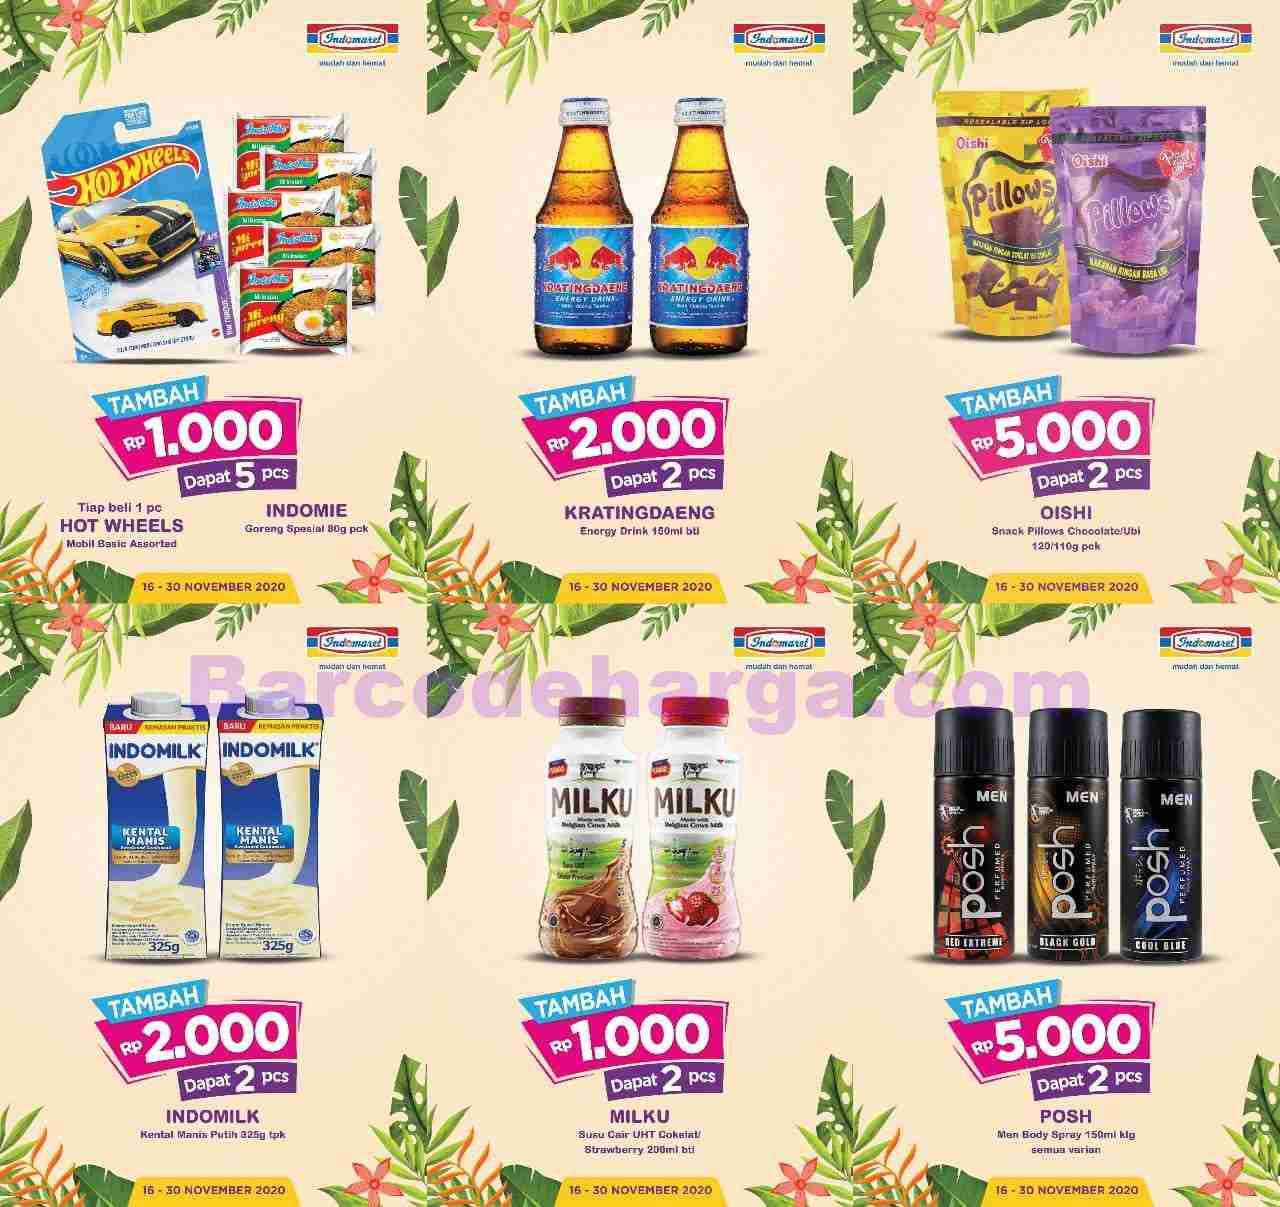 Katalog Indomaret Promosi Bulan Ini Terbaru 1 15 Desember 2020 Barcodeharga Harga Promo Alfamart Indomaret Giant Hypermart Superindo Lottemart Carrefour